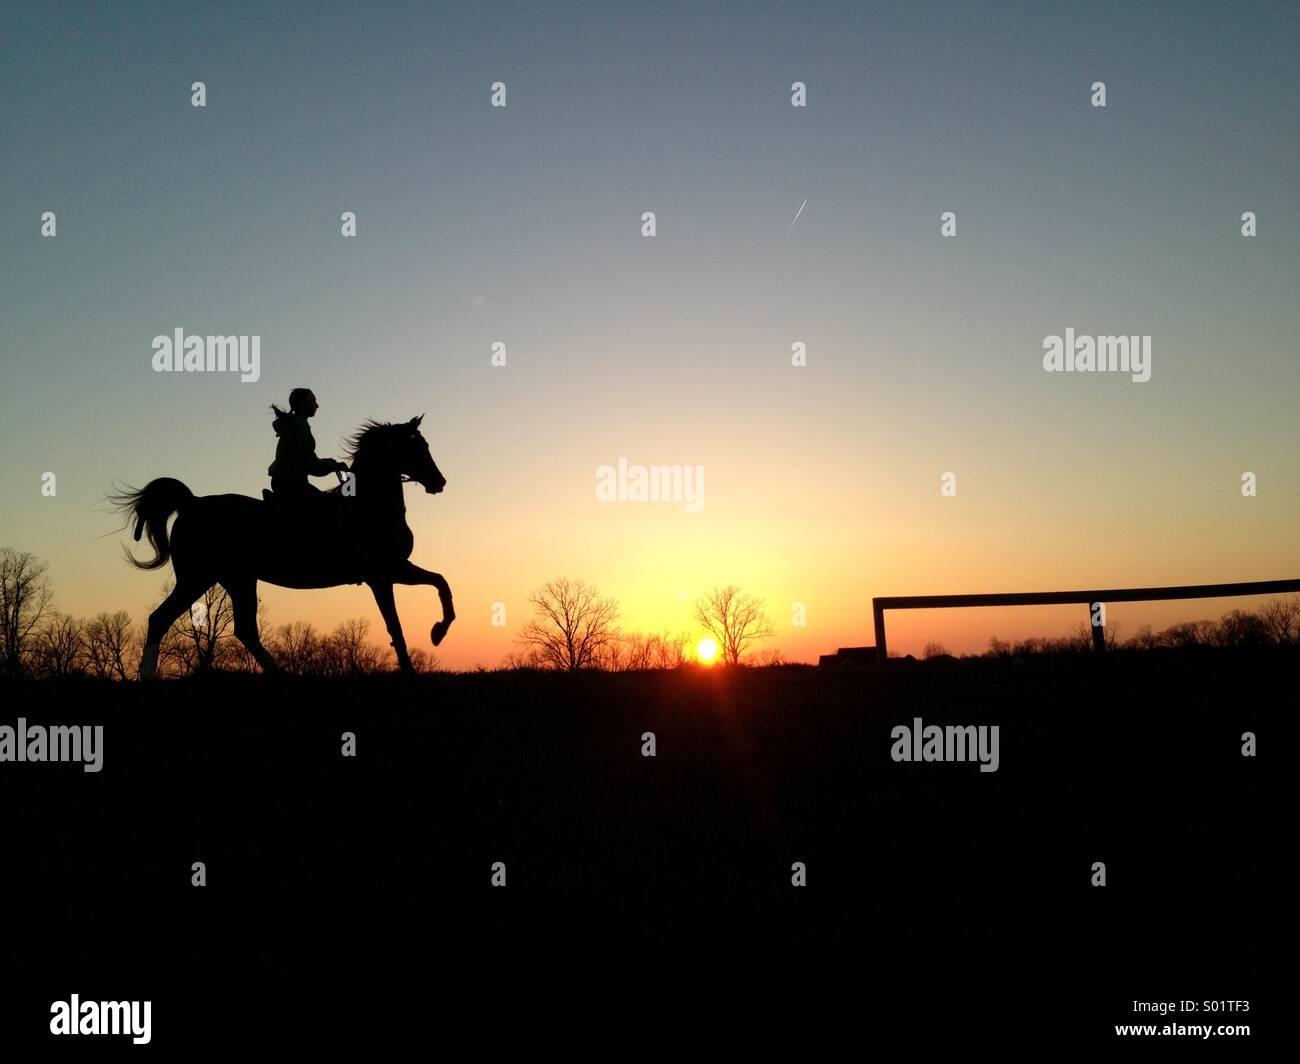 Girl riding saddlebred horse in sunset - Stock Image